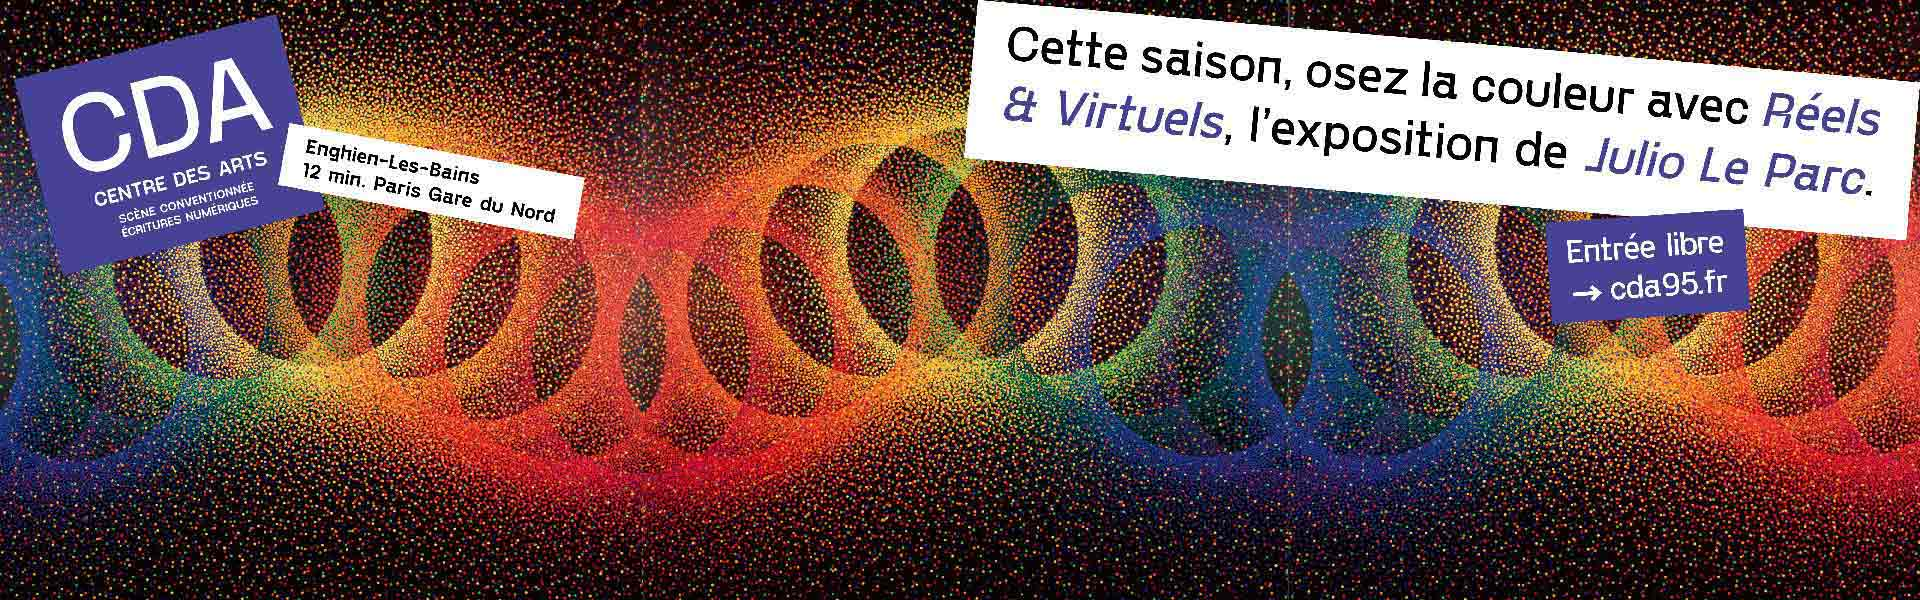 CDA-Enghien les Bains-Reels et virtuels